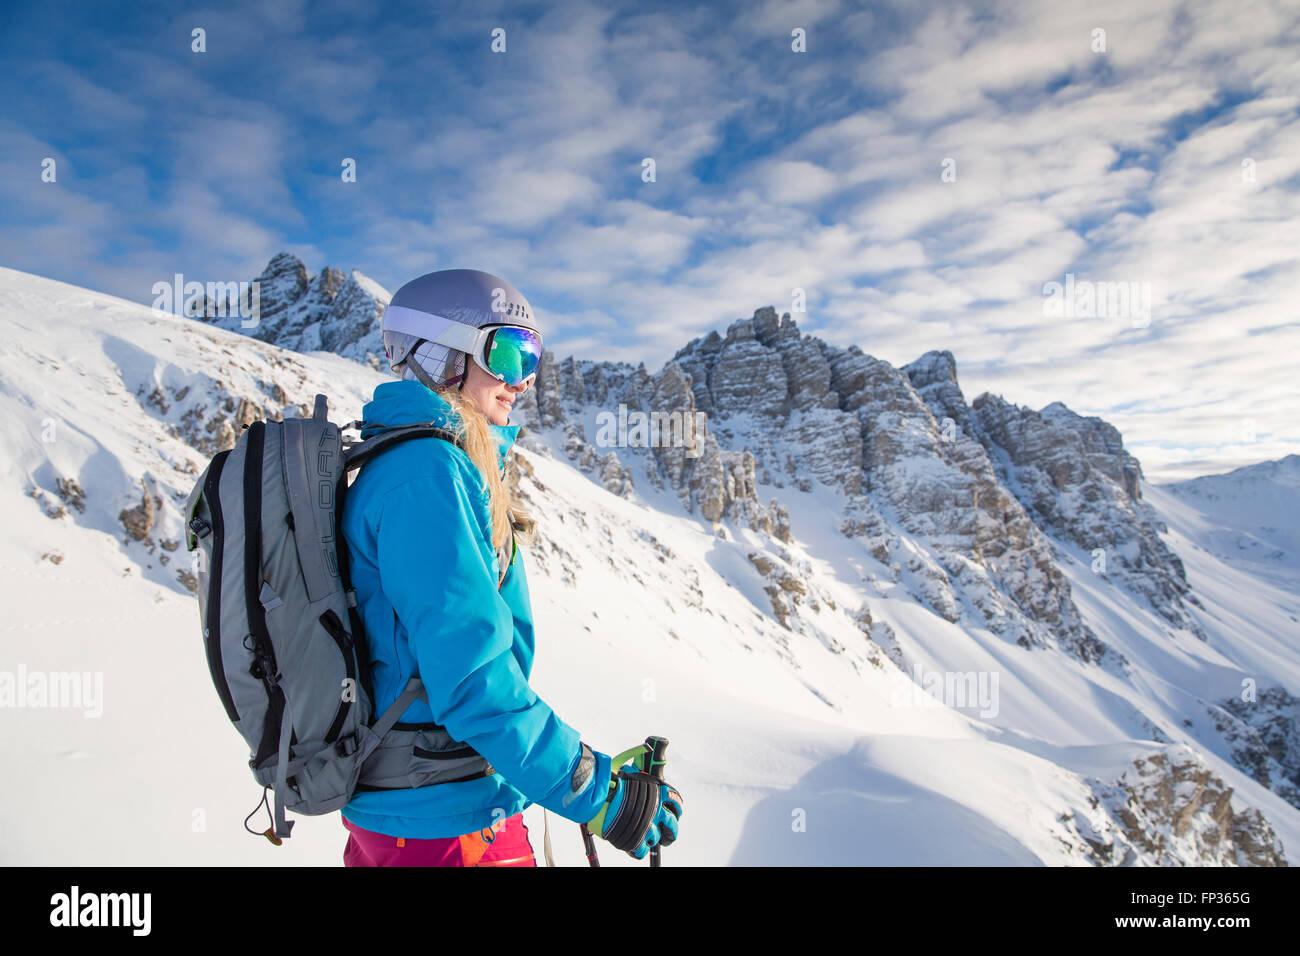 Skier, freerider with ski goggles and helmet looking into the distance, Kalkkögel behind, Axamer Lizum, Tyrol, - Stock Image